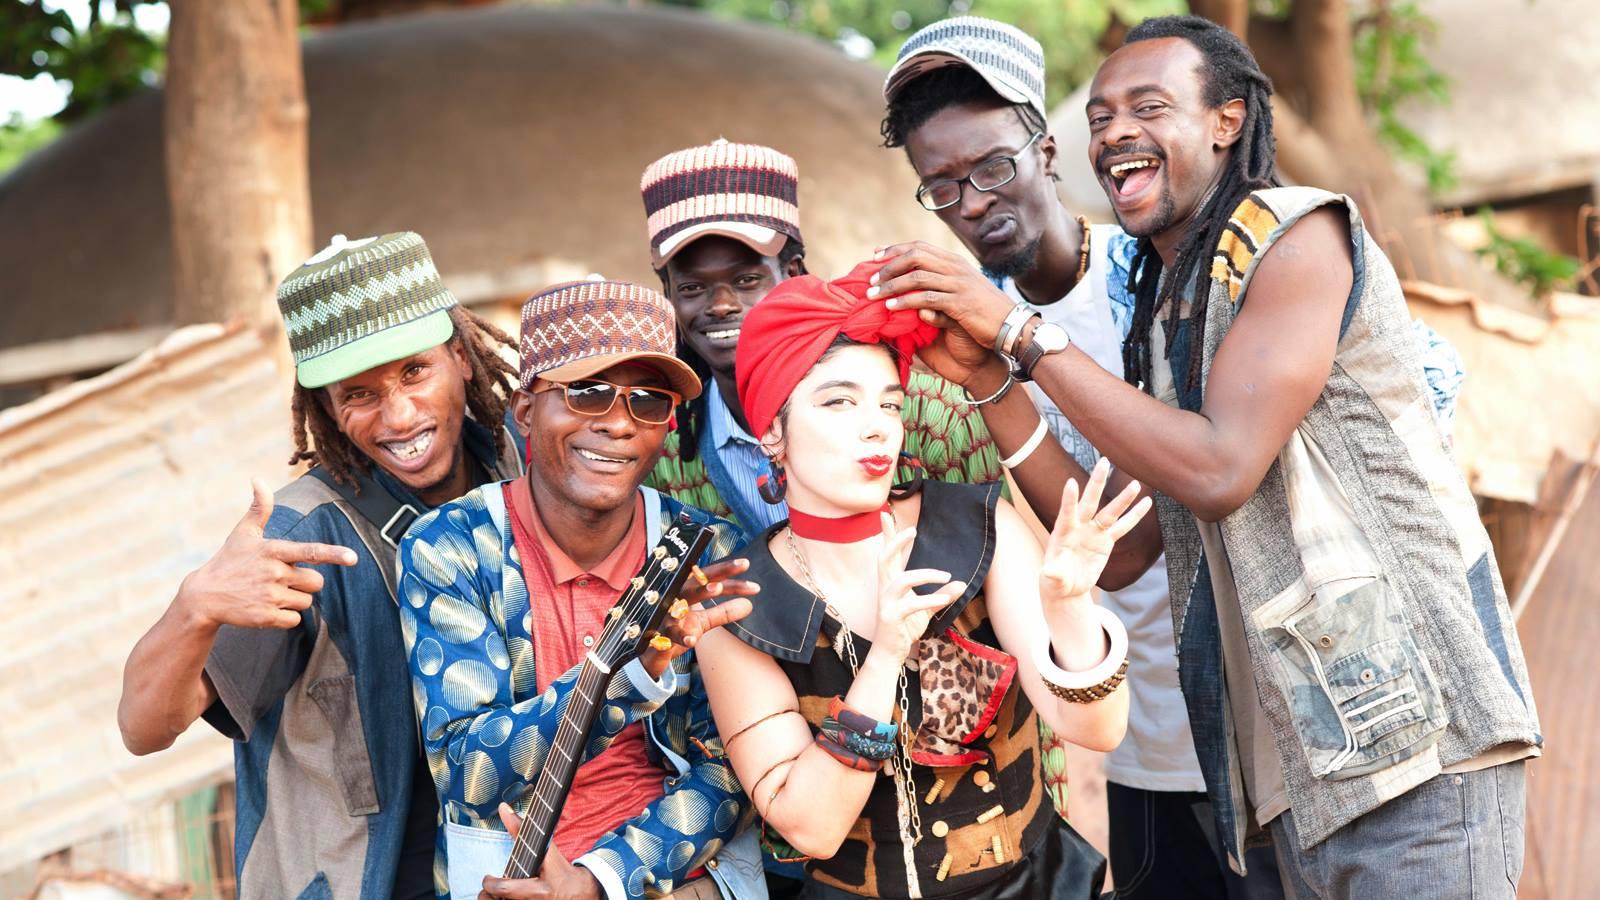 L'avventura di Corinna Fiora, cantante e copywriter a Dakar